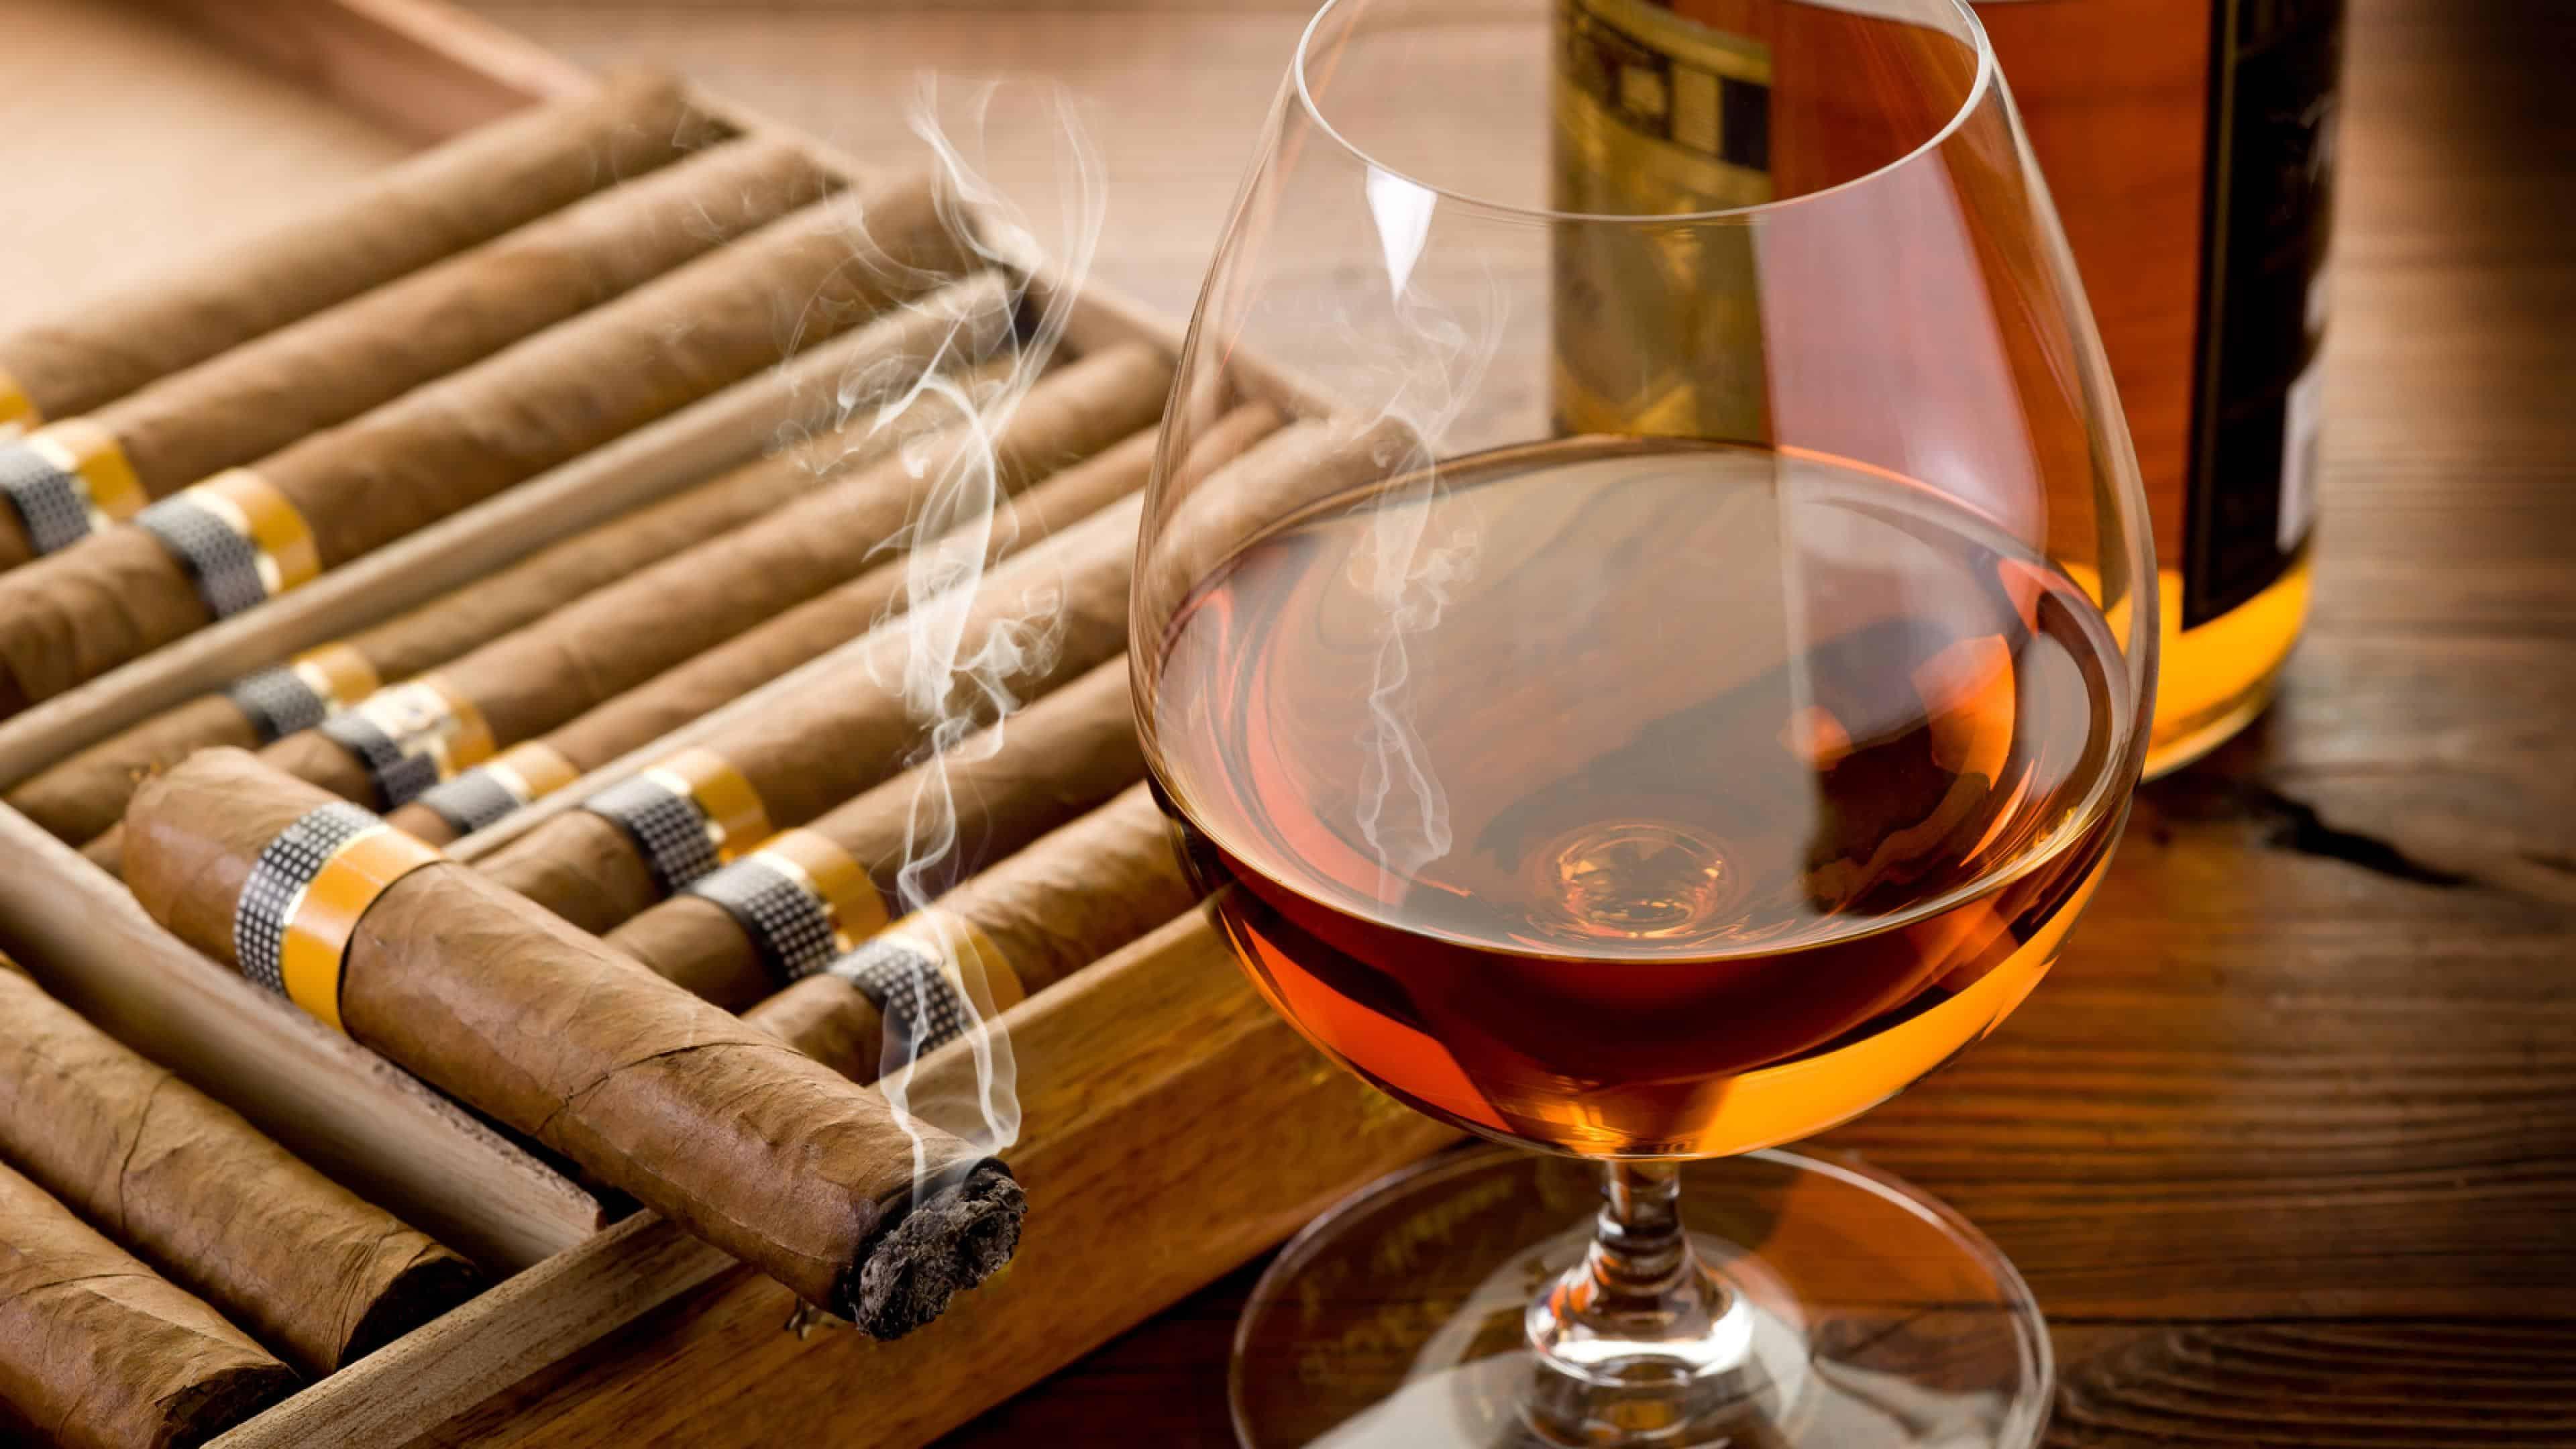 cuban cigar and glass of cognac uhd 4k wallpaper